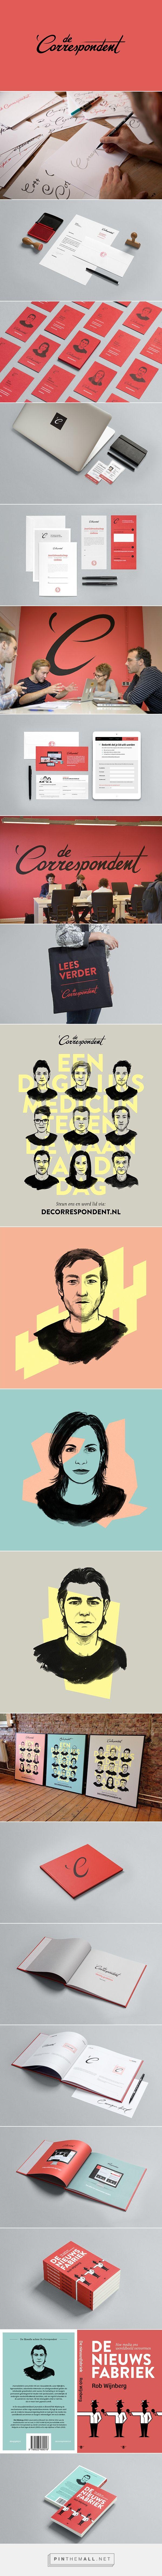 De Correspondent - Branding & Books by Momkai